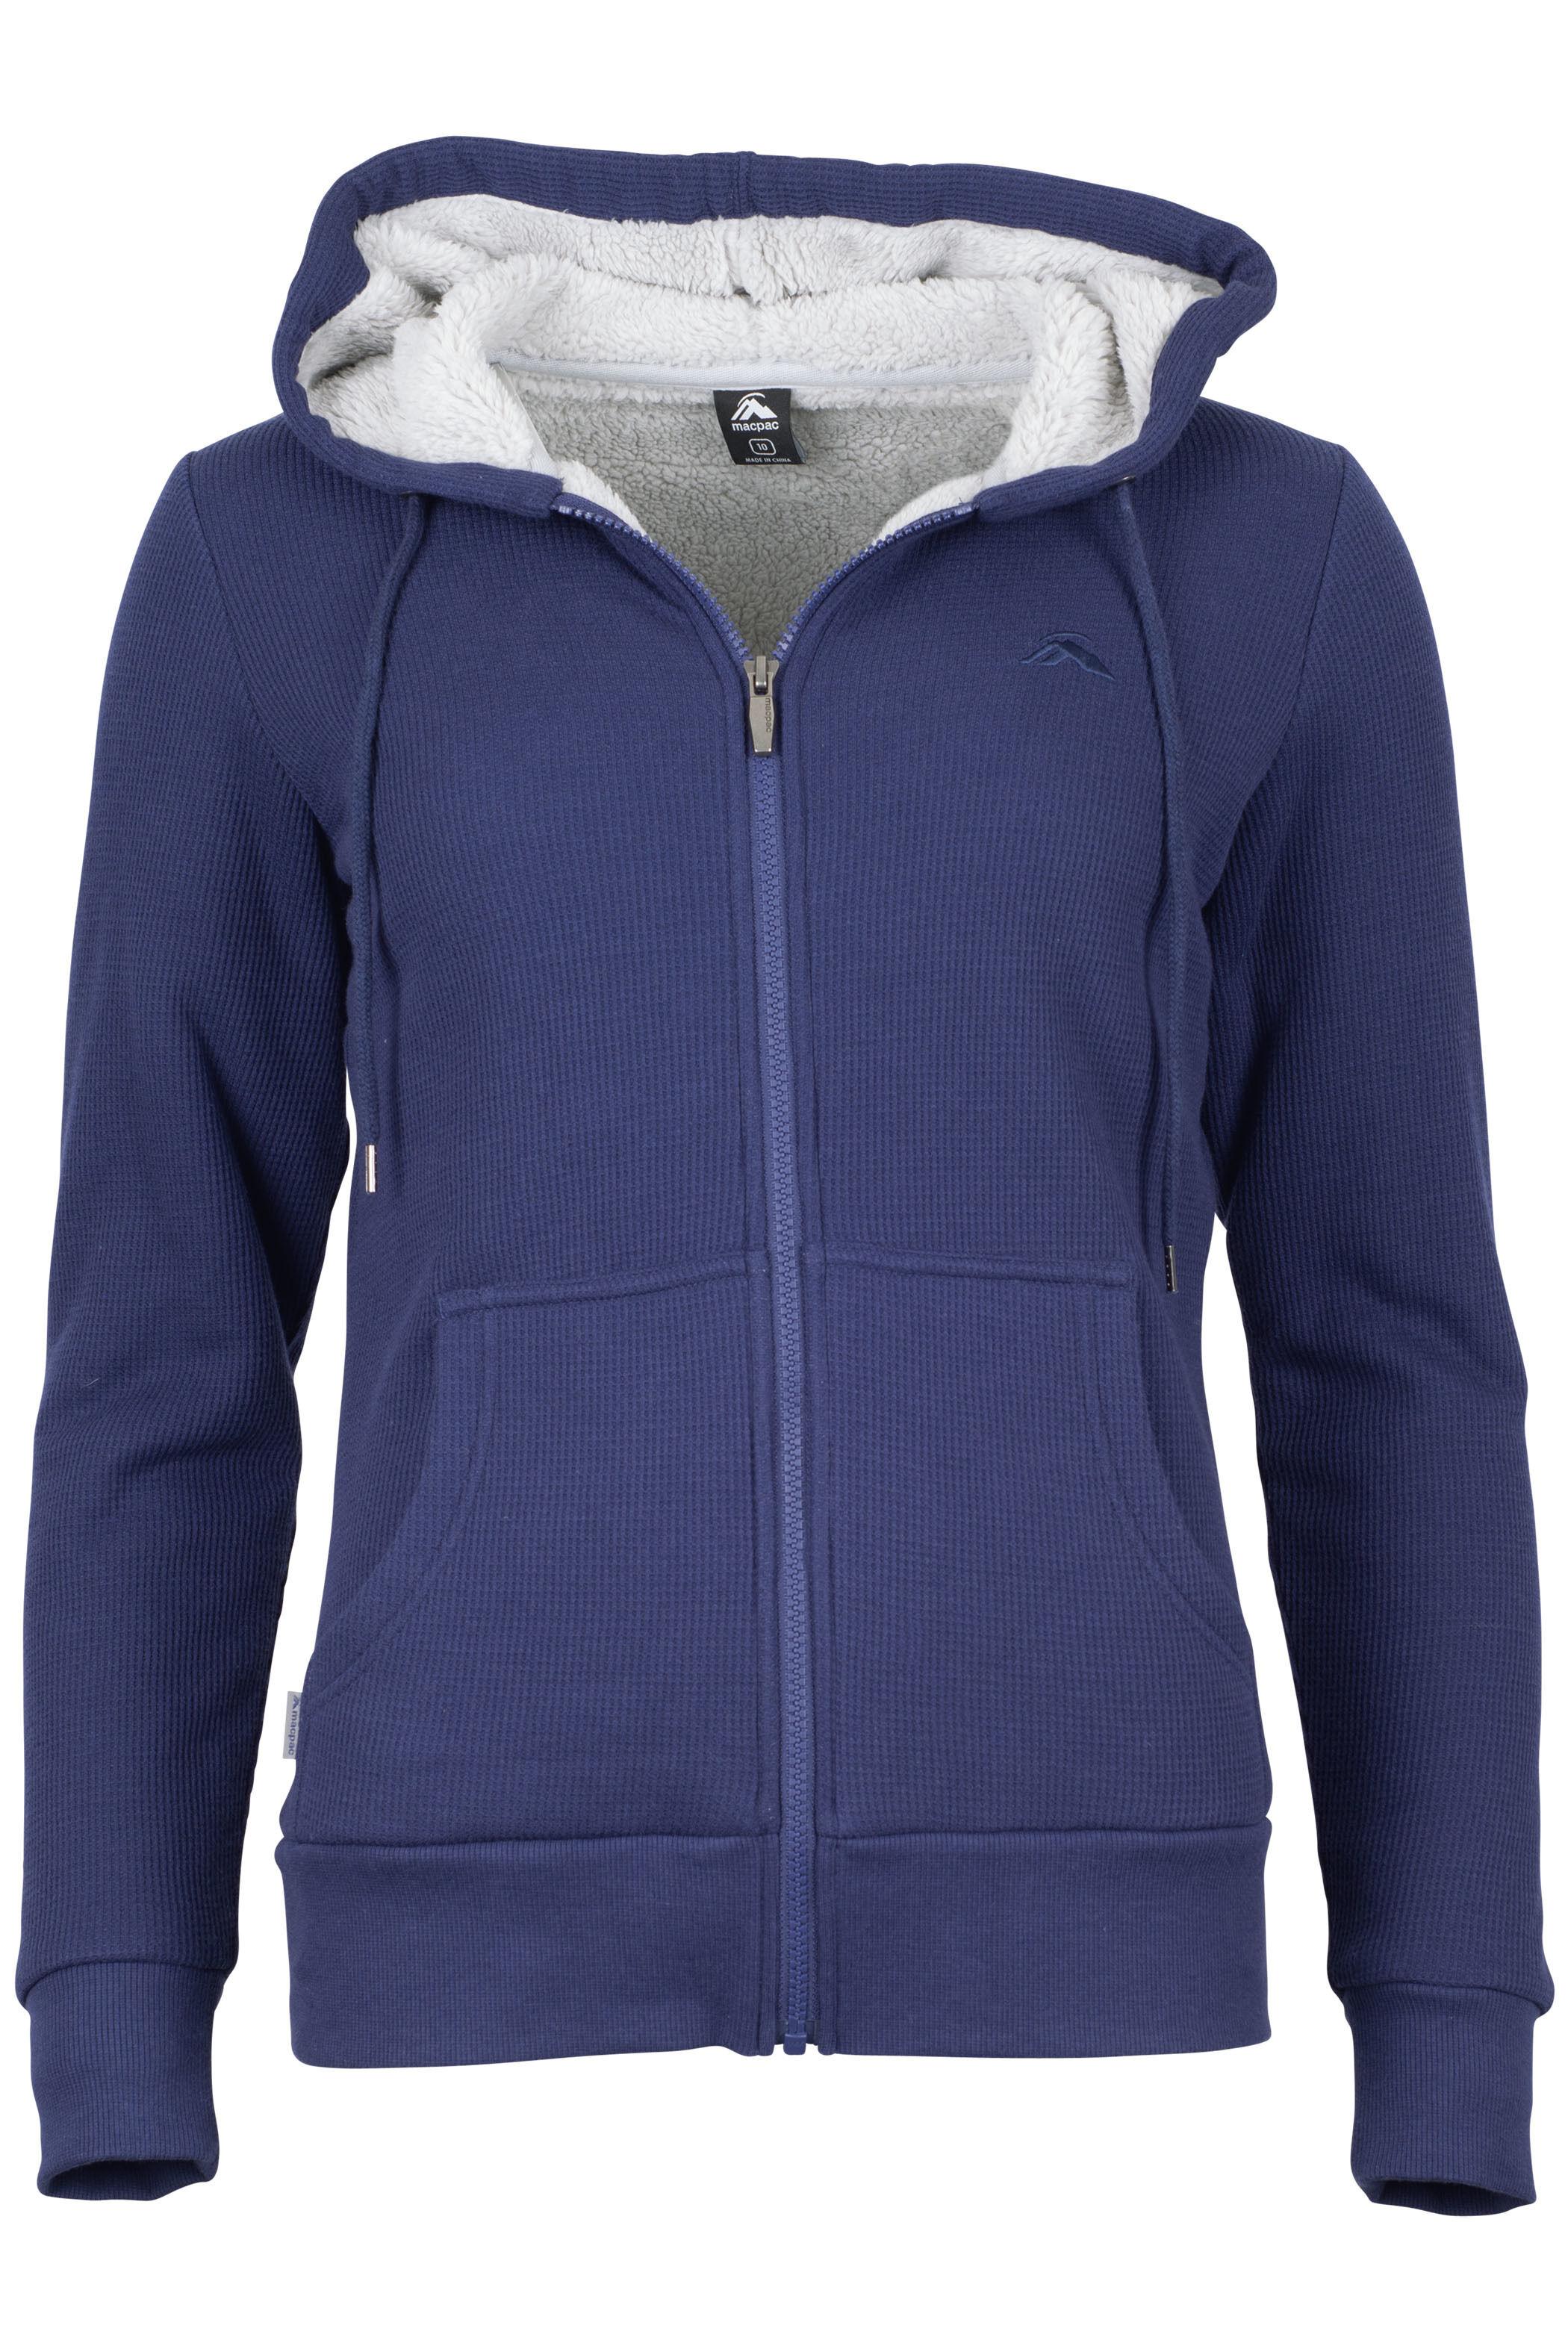 jackets ebay north uk womens face xwnvRFq8Og da645b355